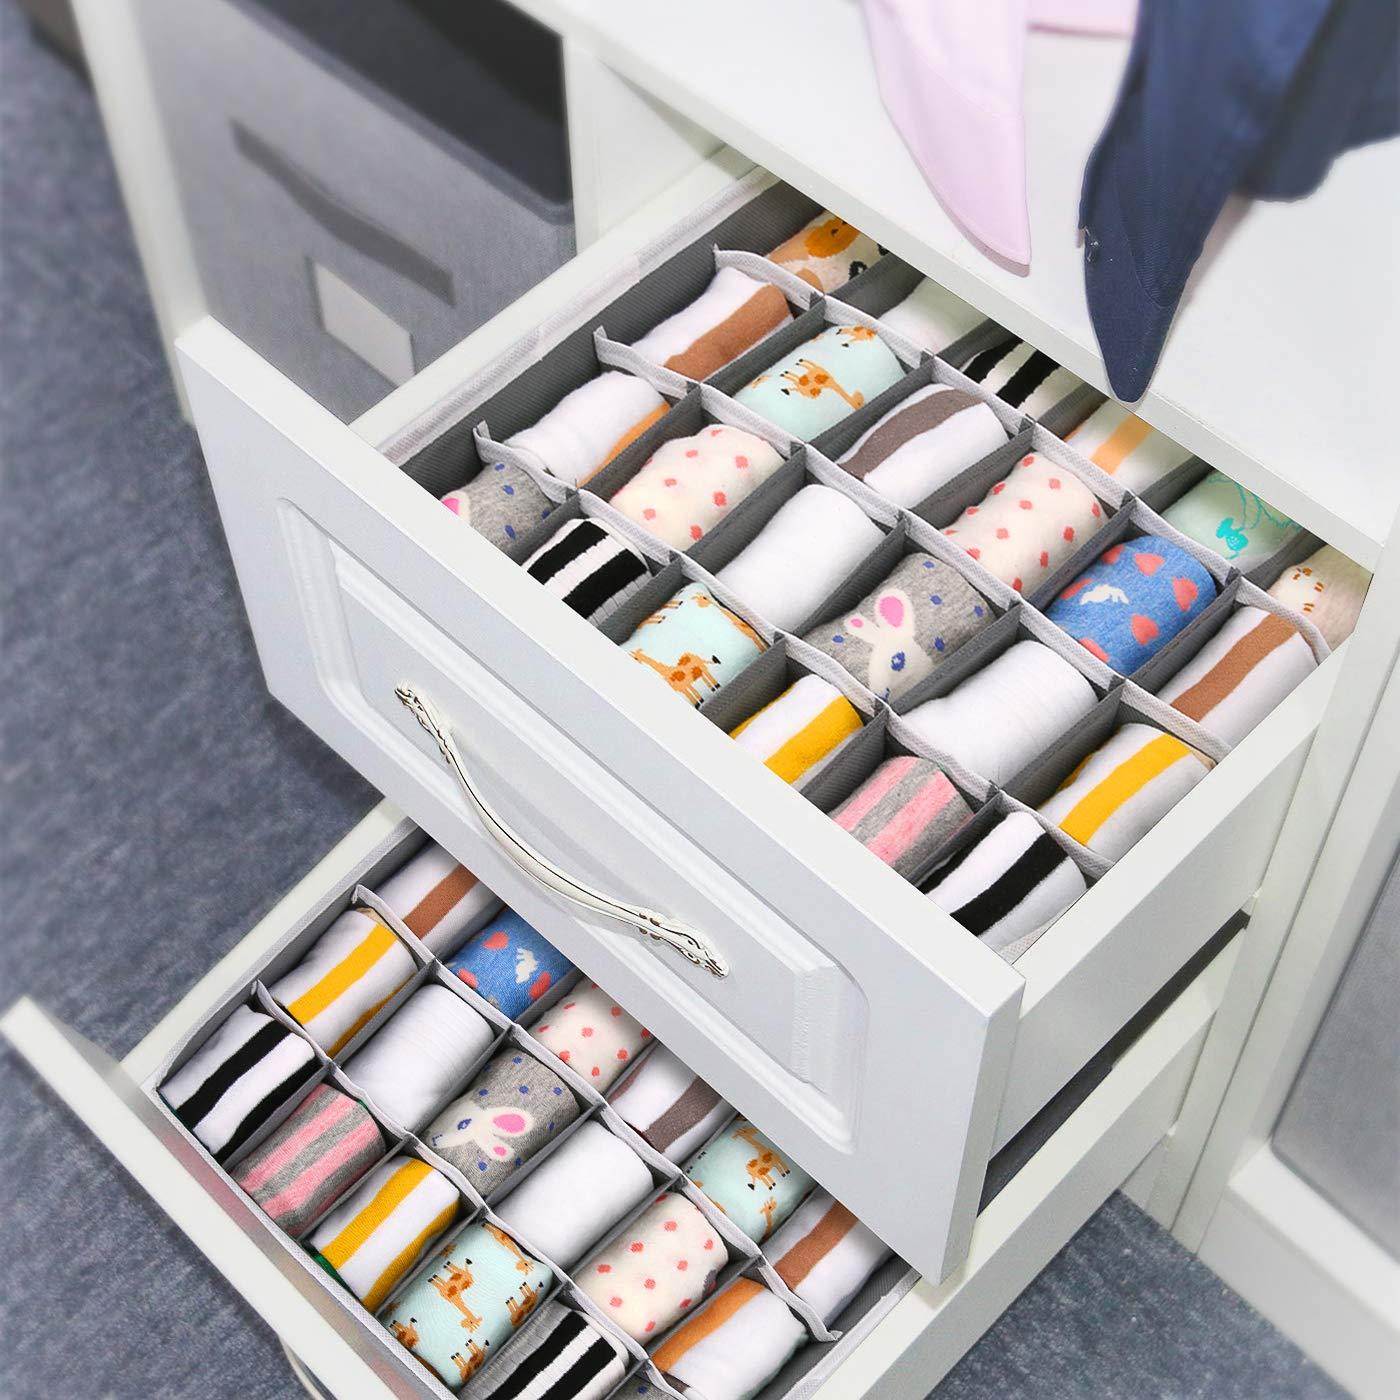 Belts Drawer Organizers Dividers 2 Packs Underwear Drawer Organizer Bra Ties LEEFE 24 Cell Collapsible Closet Cabinet Organizer Underwear Storage Boxes for Storing Socks Handkerchiefs